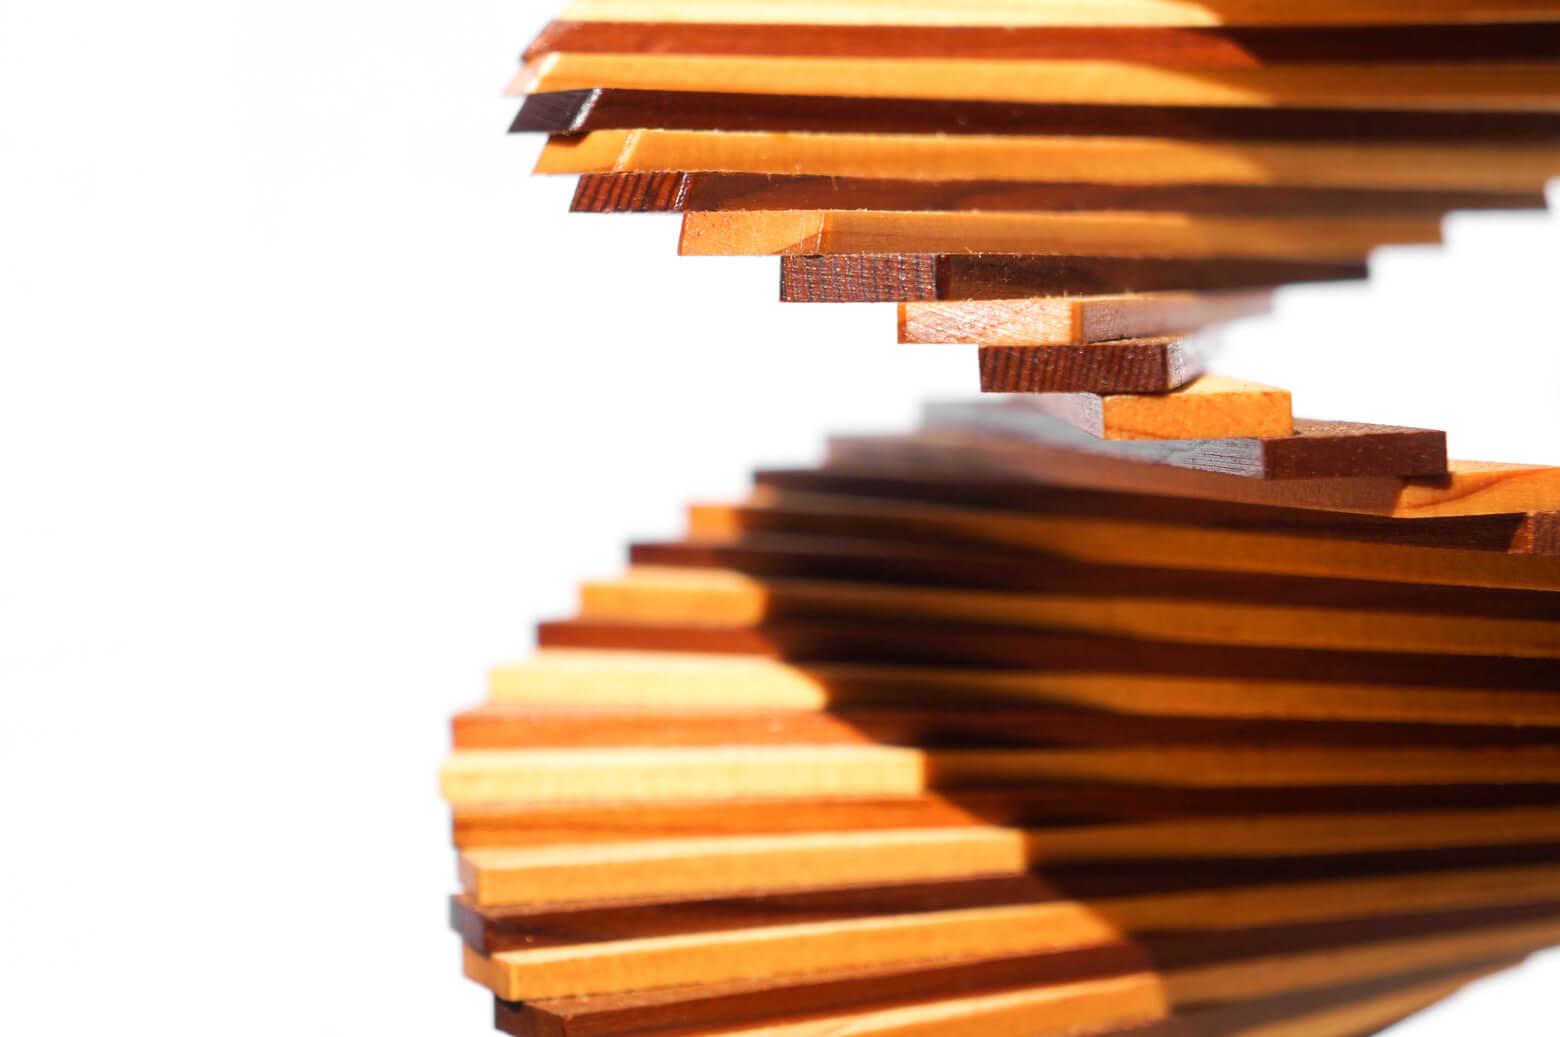 Wood Wind Spinner/ウッド ウィンド スピナー 木製モビール インテリア スモールサイズ